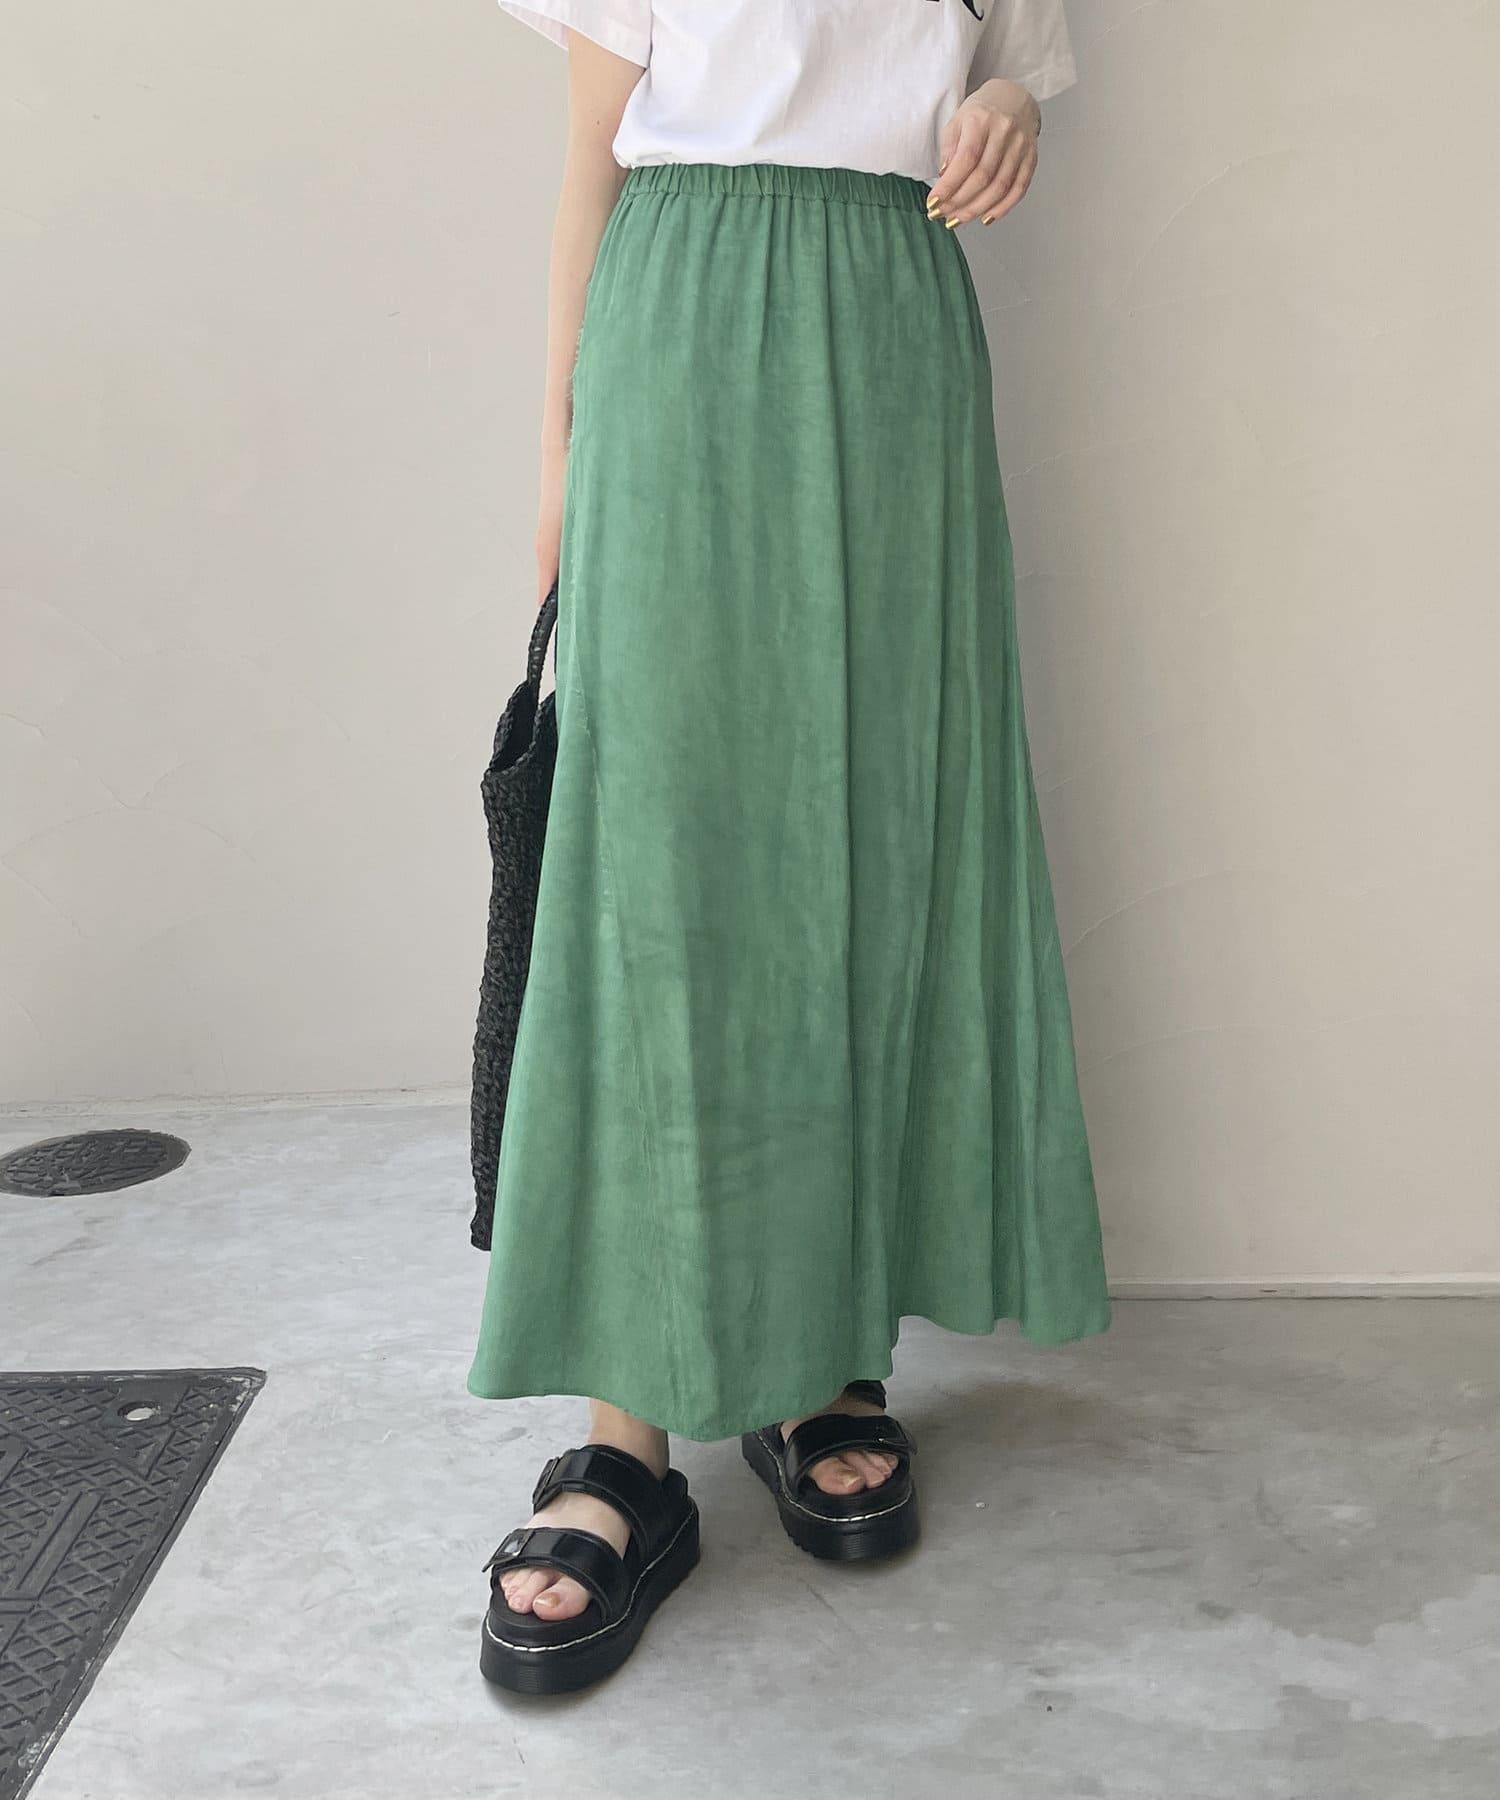 CAPRICIEUX LE'MAGE(カプリシュレマージュ) ムラ染めフレアスカート